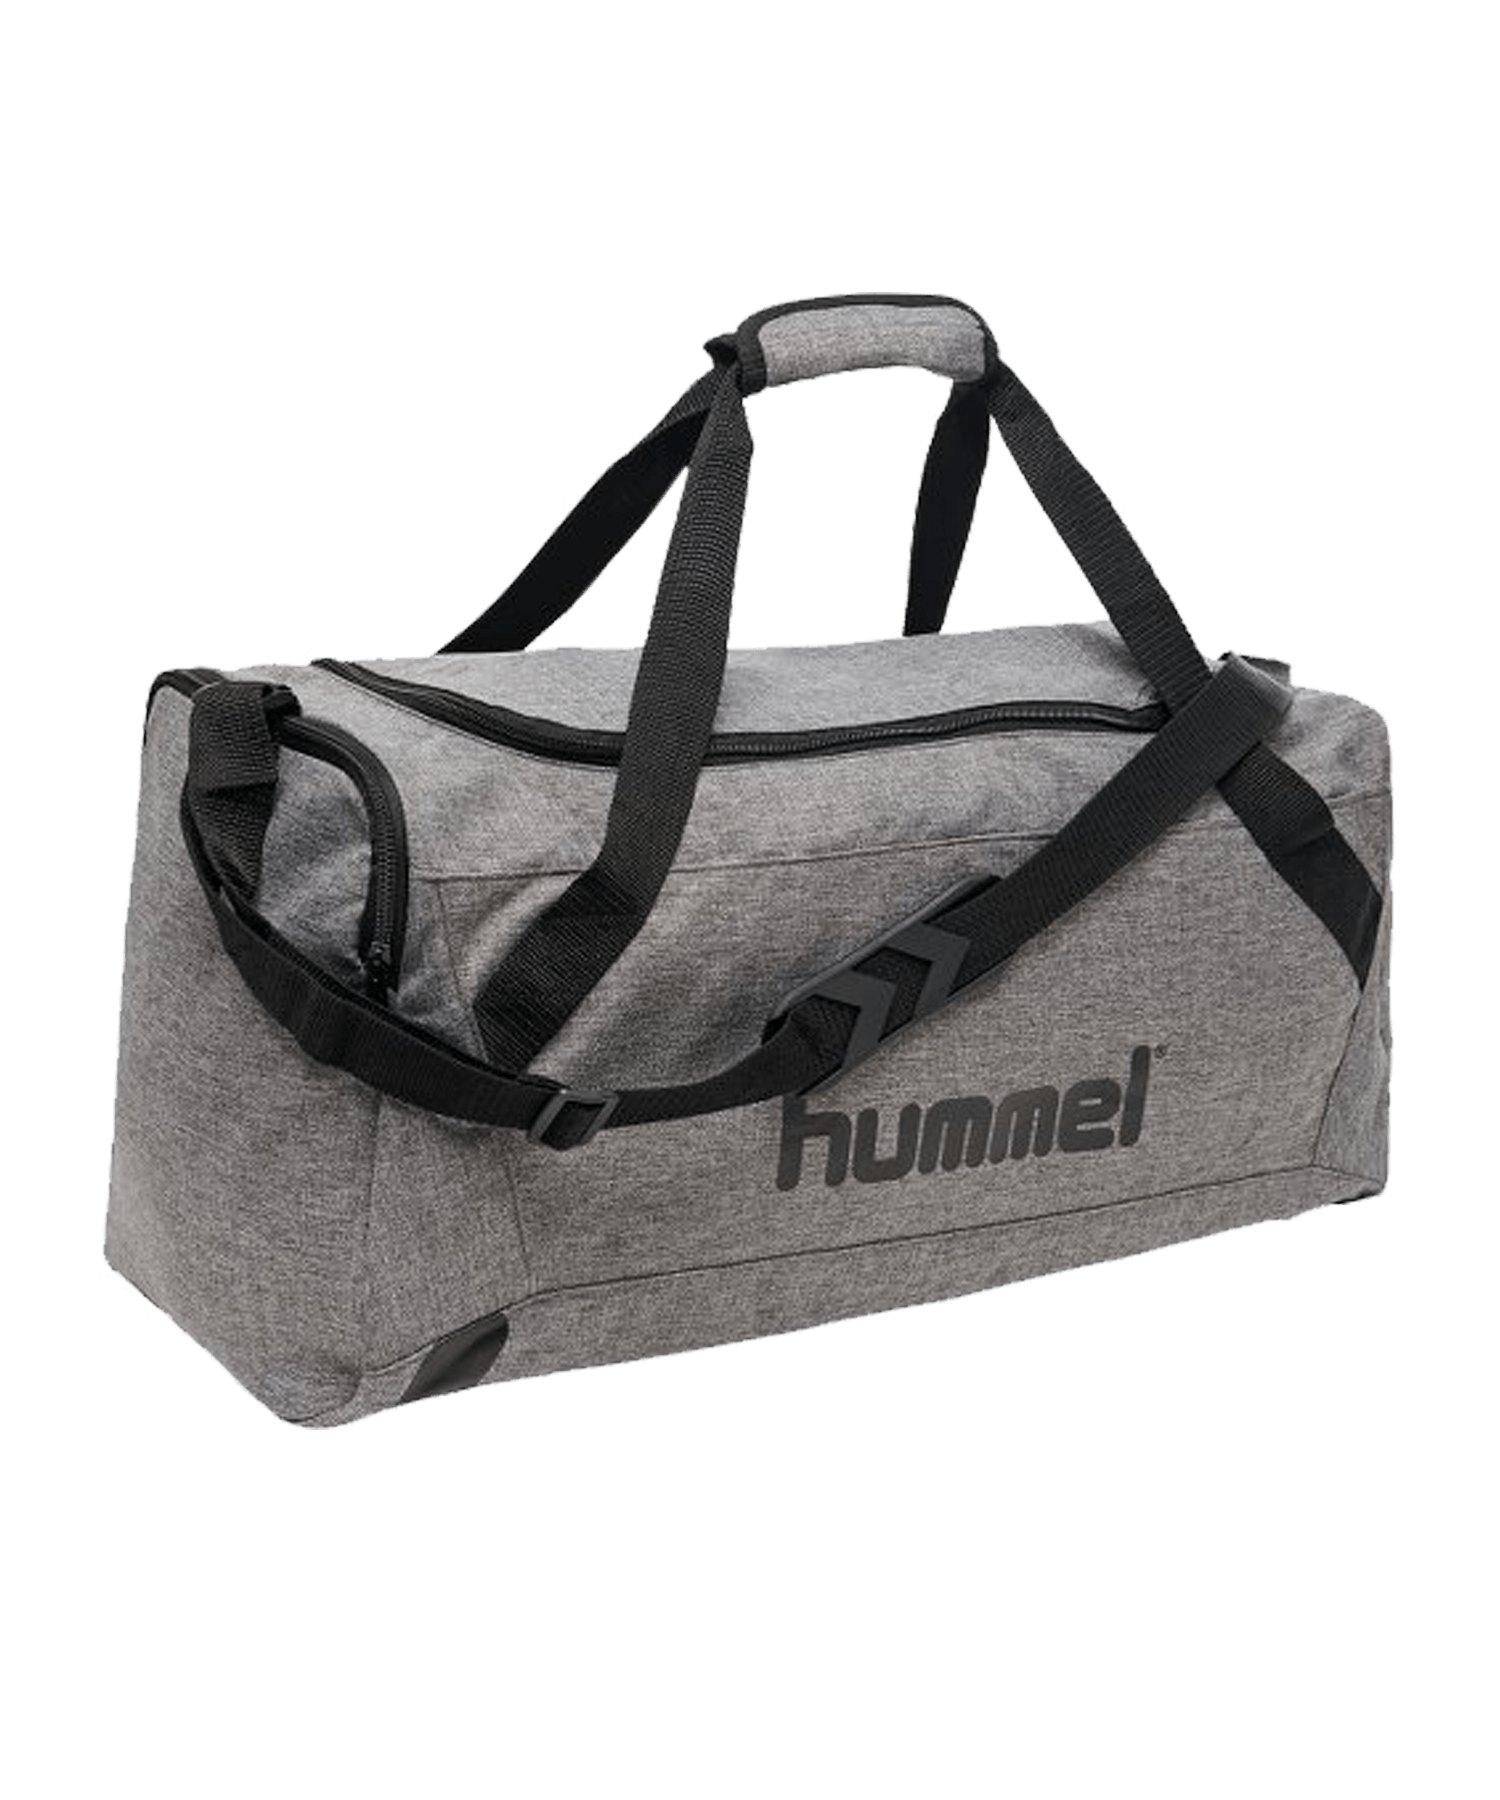 Hummel Core Bag Sporttasche Grau F2006 Gr.S - grau